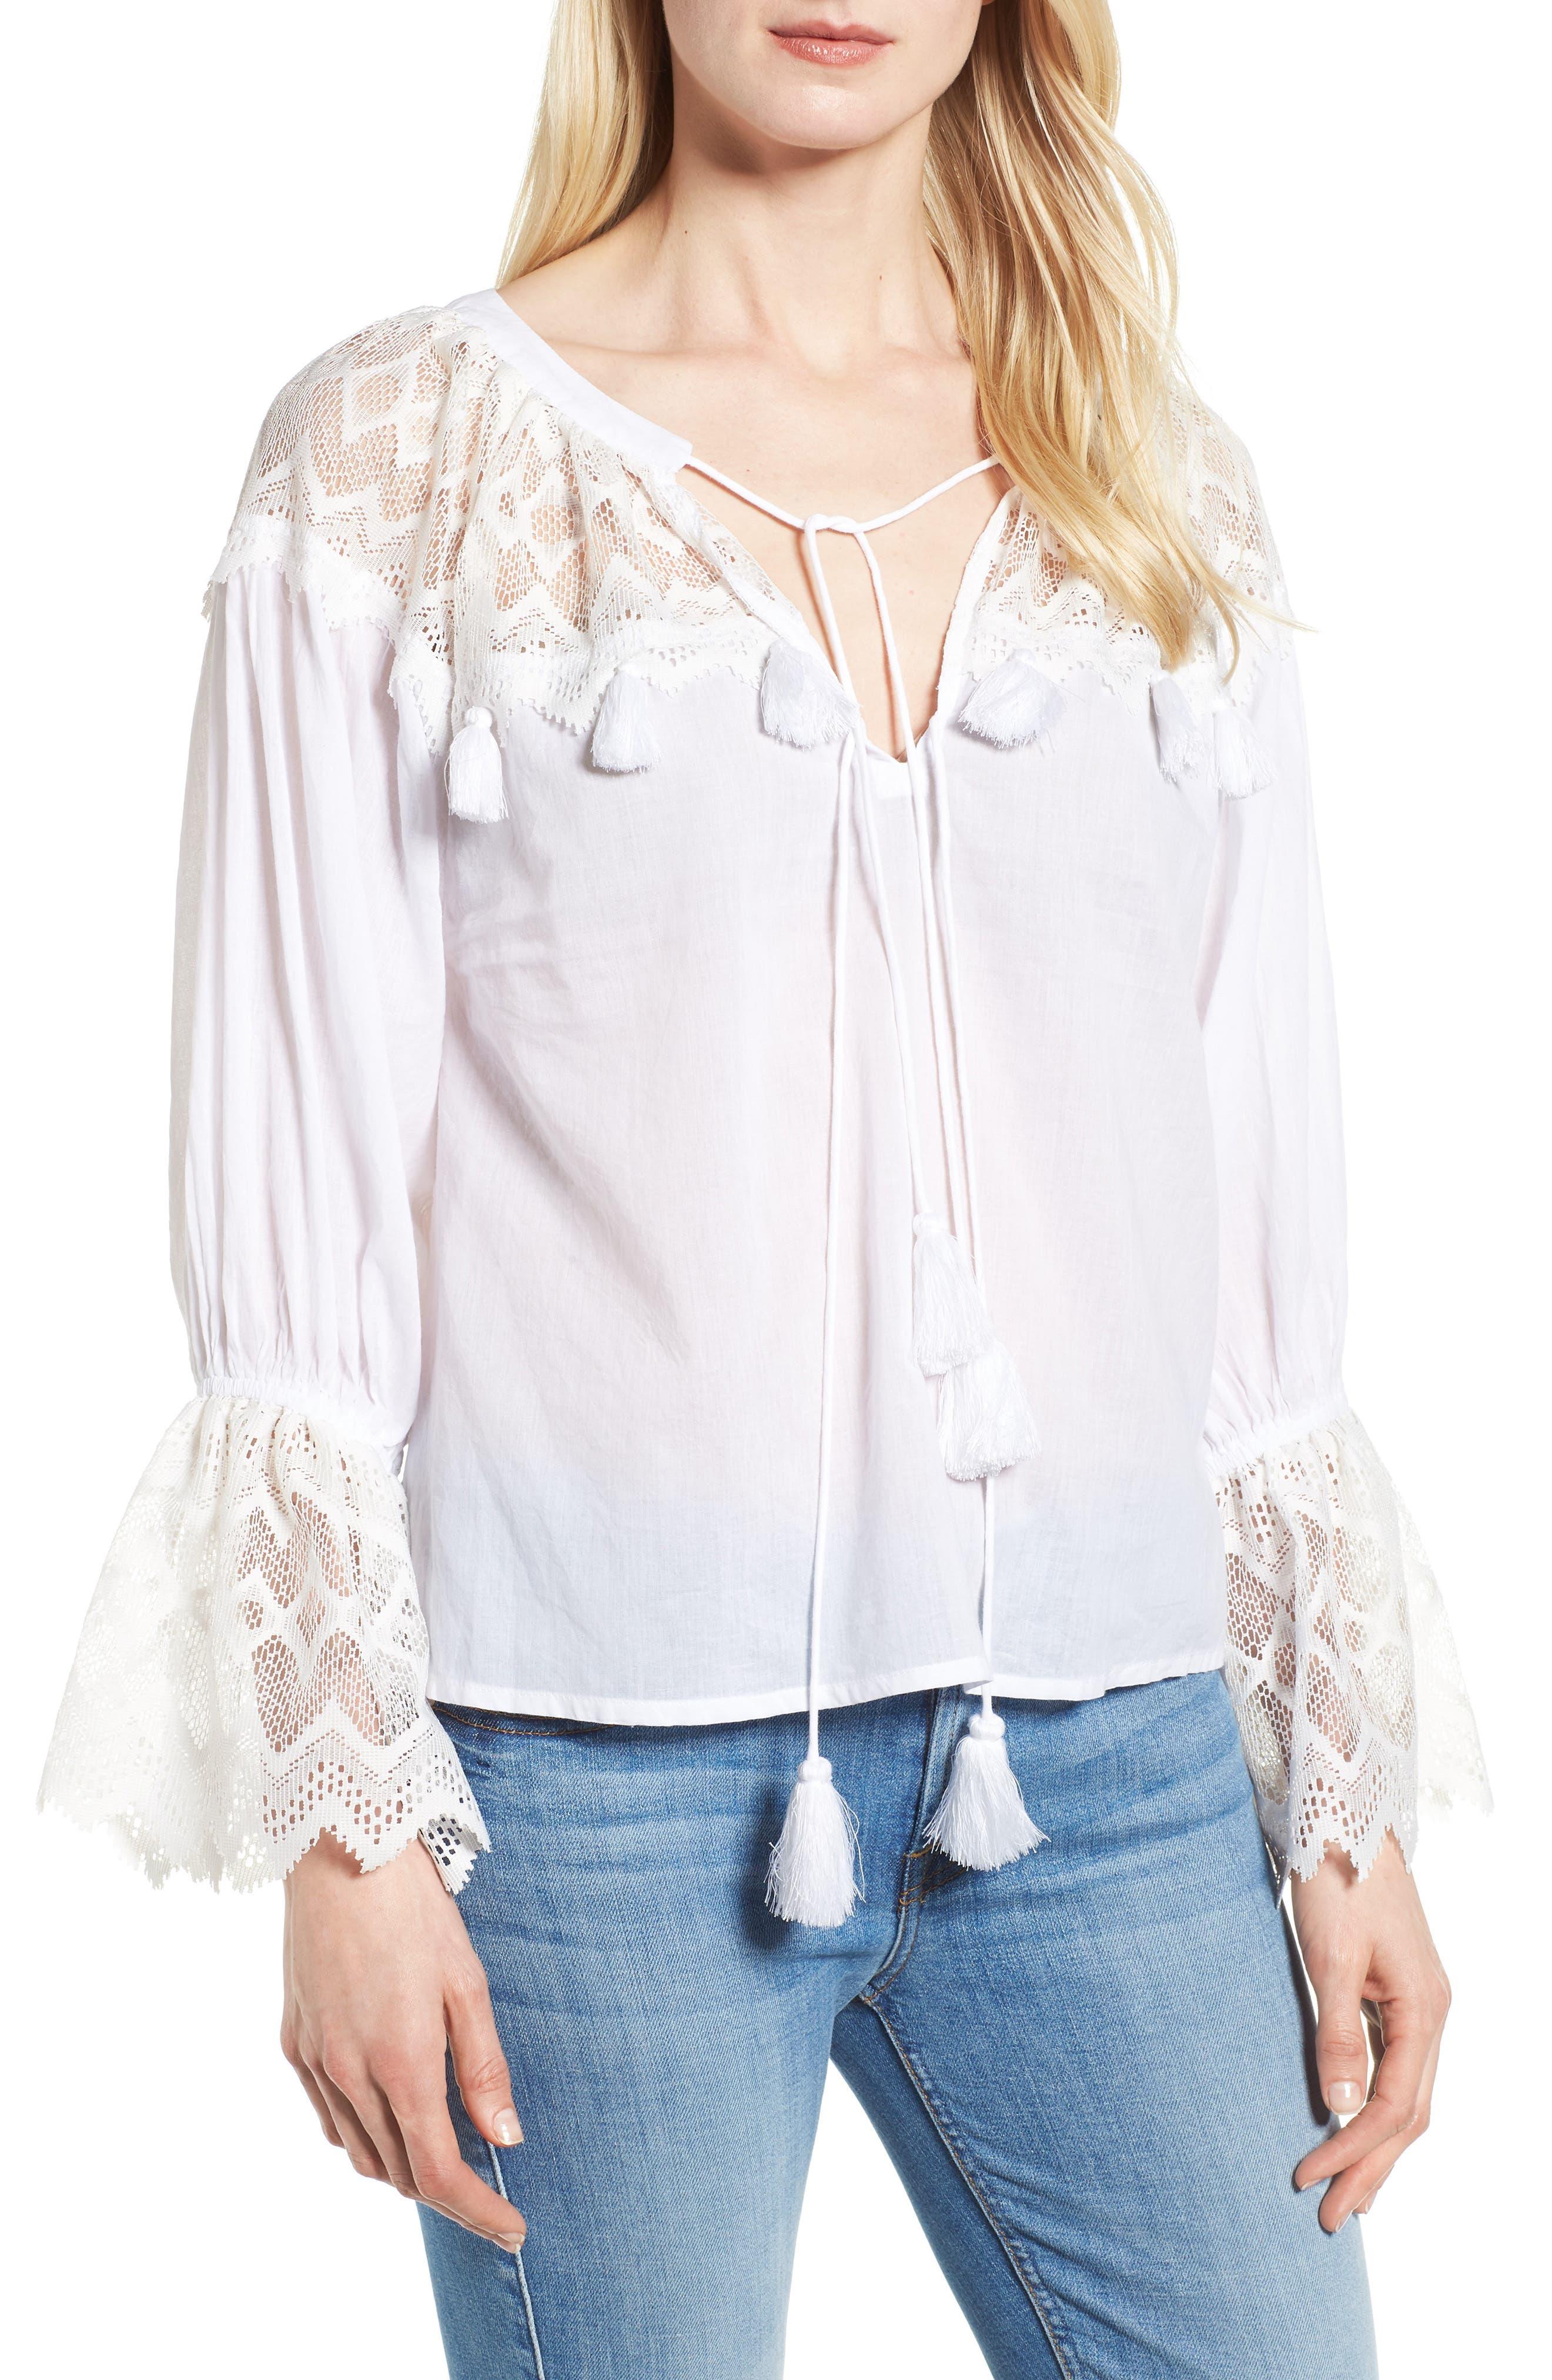 Berkley White Lace Cotton Blend Top,                         Main,                         color, WHITE